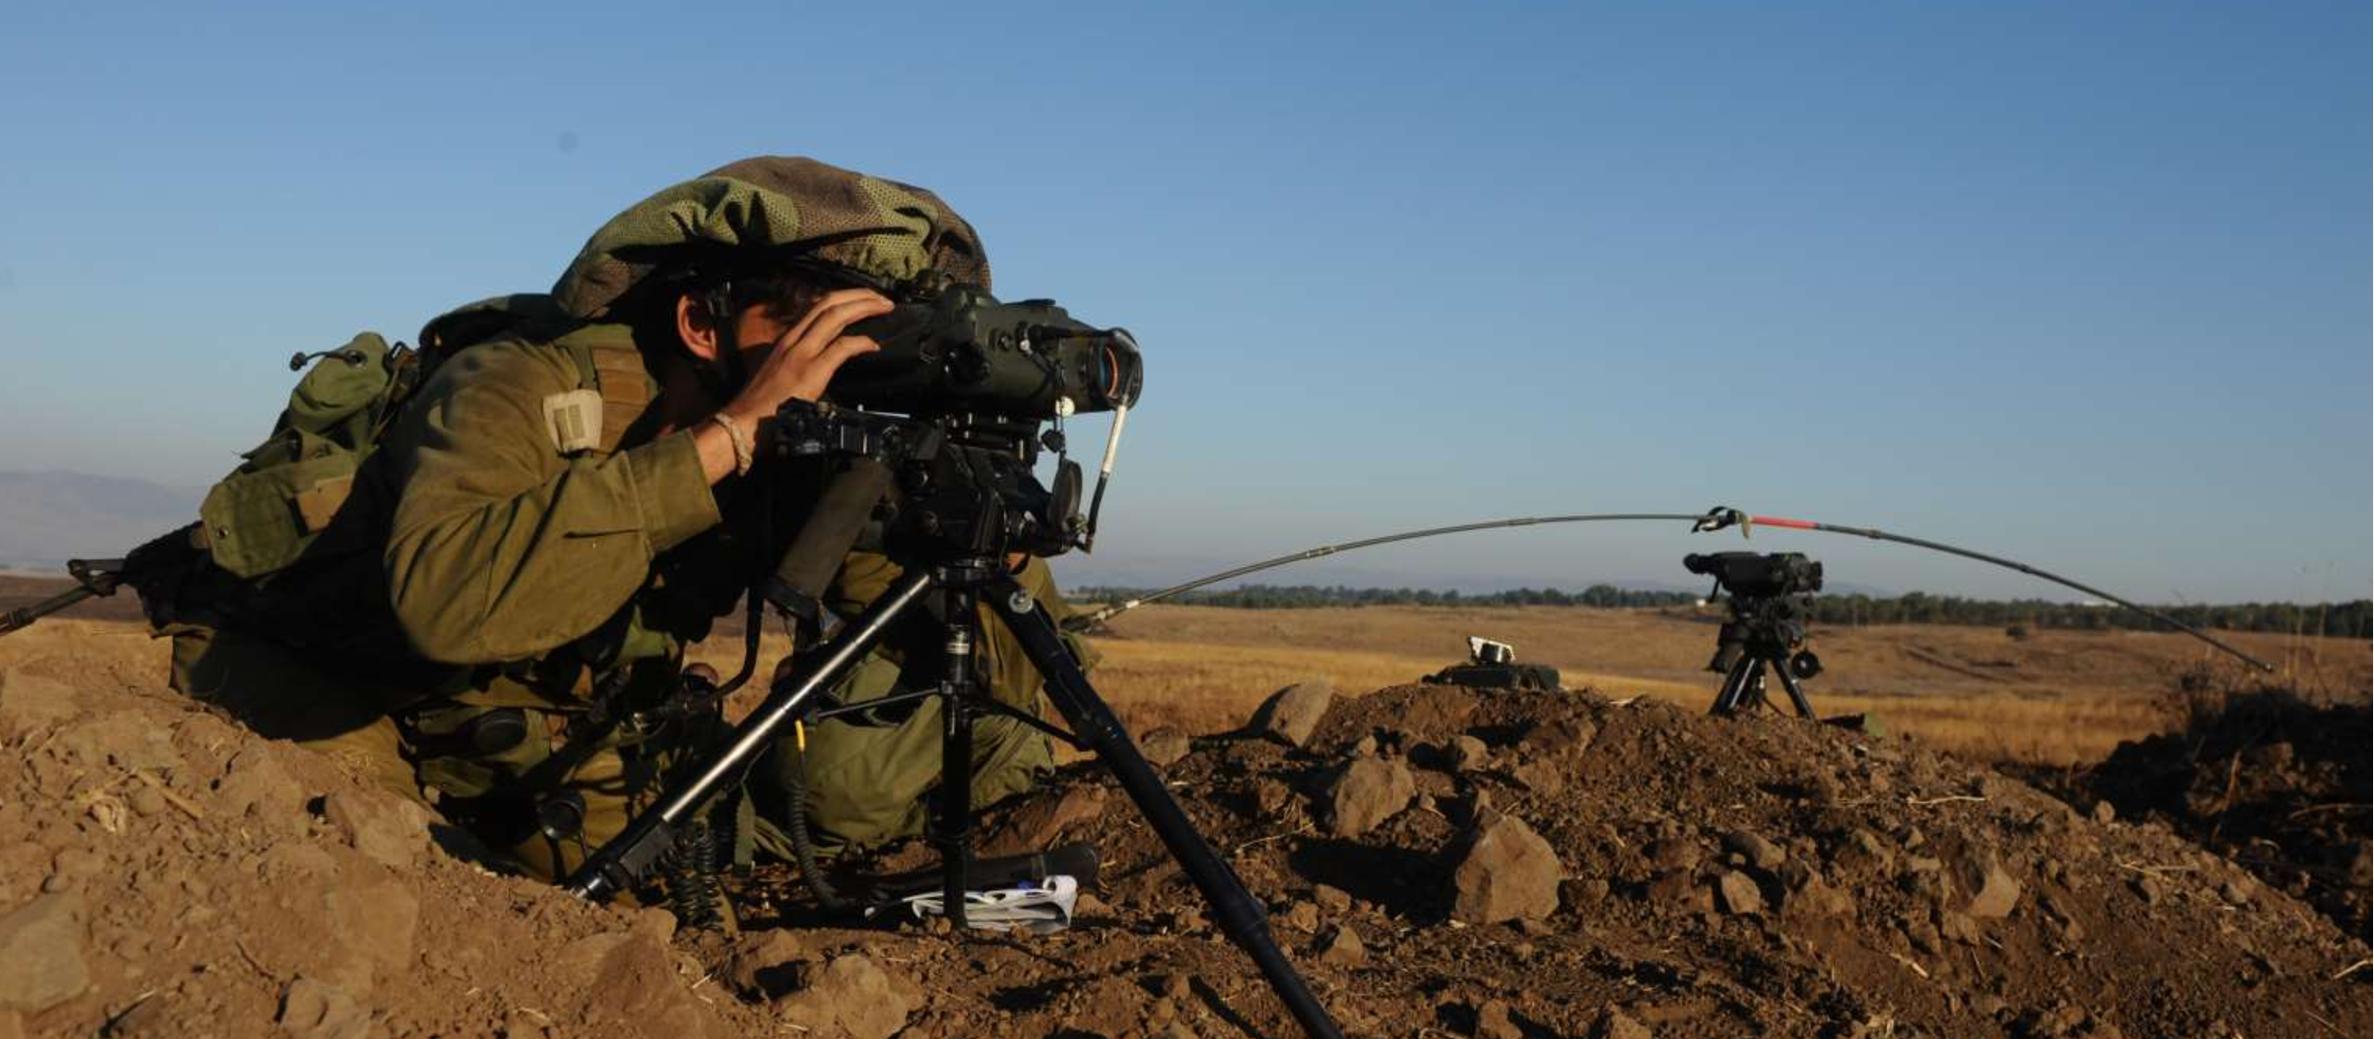 IDF plans for possible Syria operation as jihadist, Hezbollah threats mount